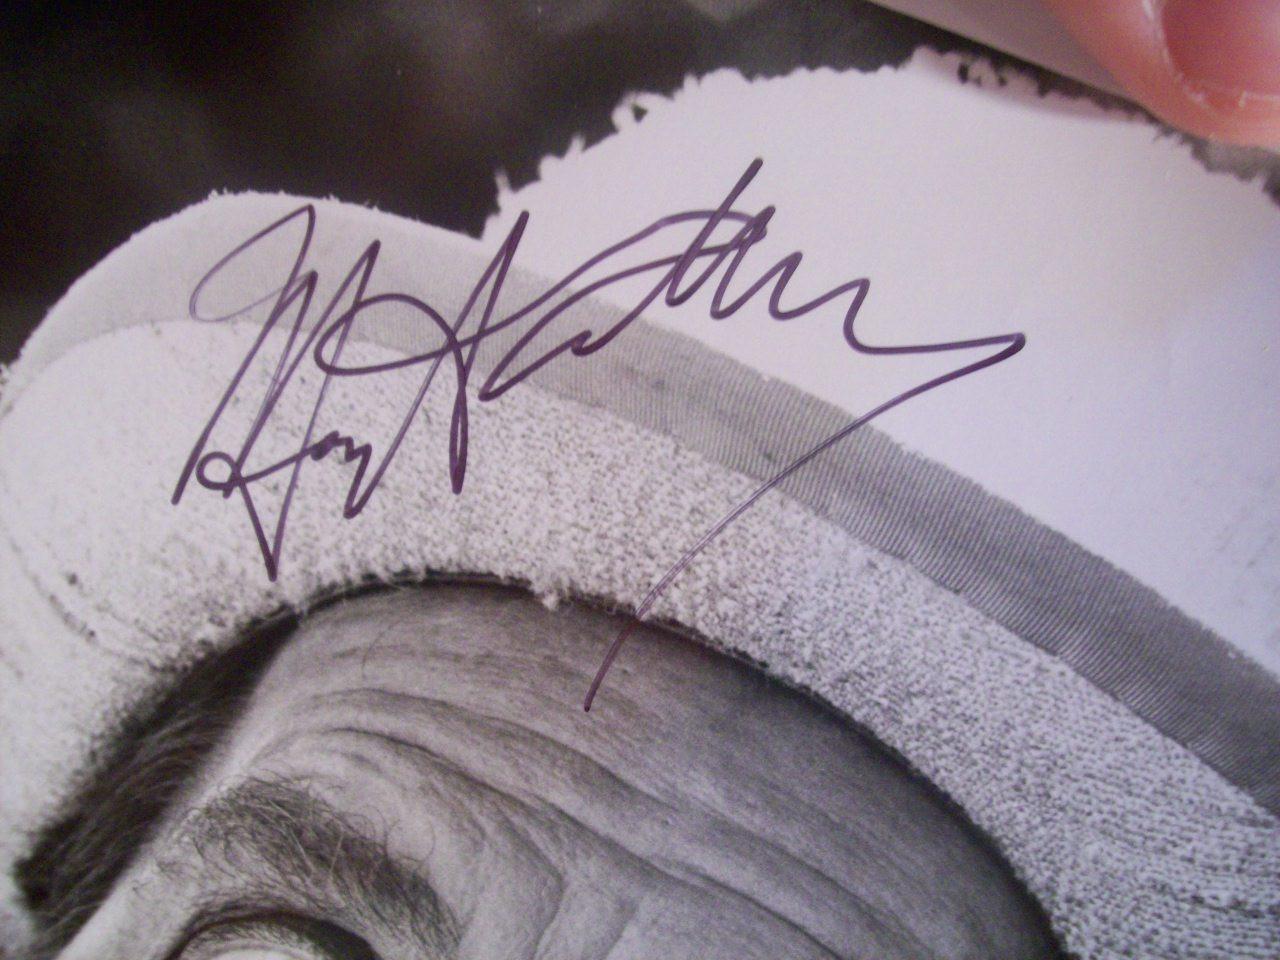 Amsterdam, Morey Photo Signed Autograph Dick Van Dyke Show